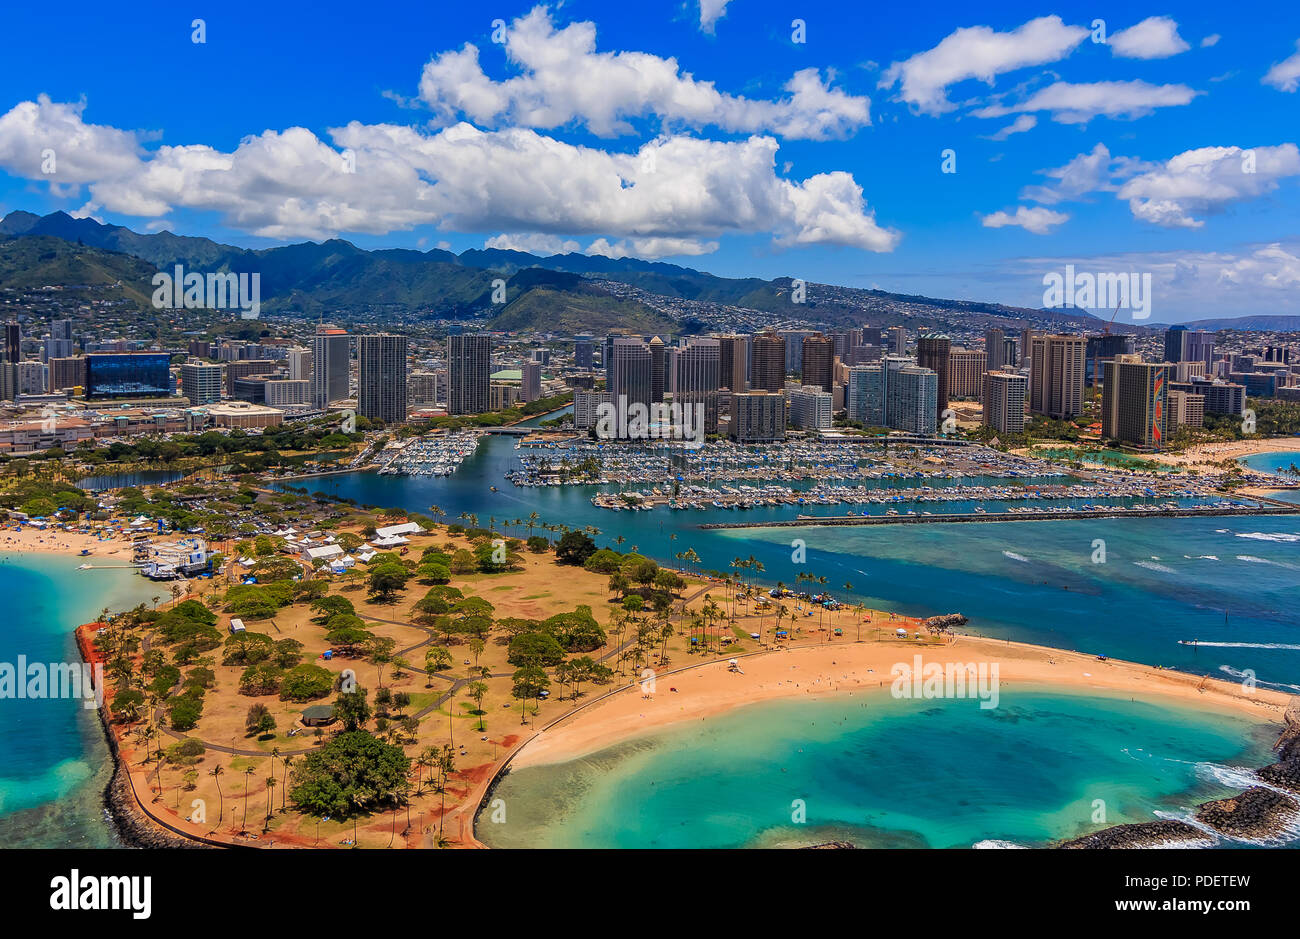 Vista aerea dell'Ala Moana Beach Park a Honolulu Hawaii da un elicottero Immagini Stock